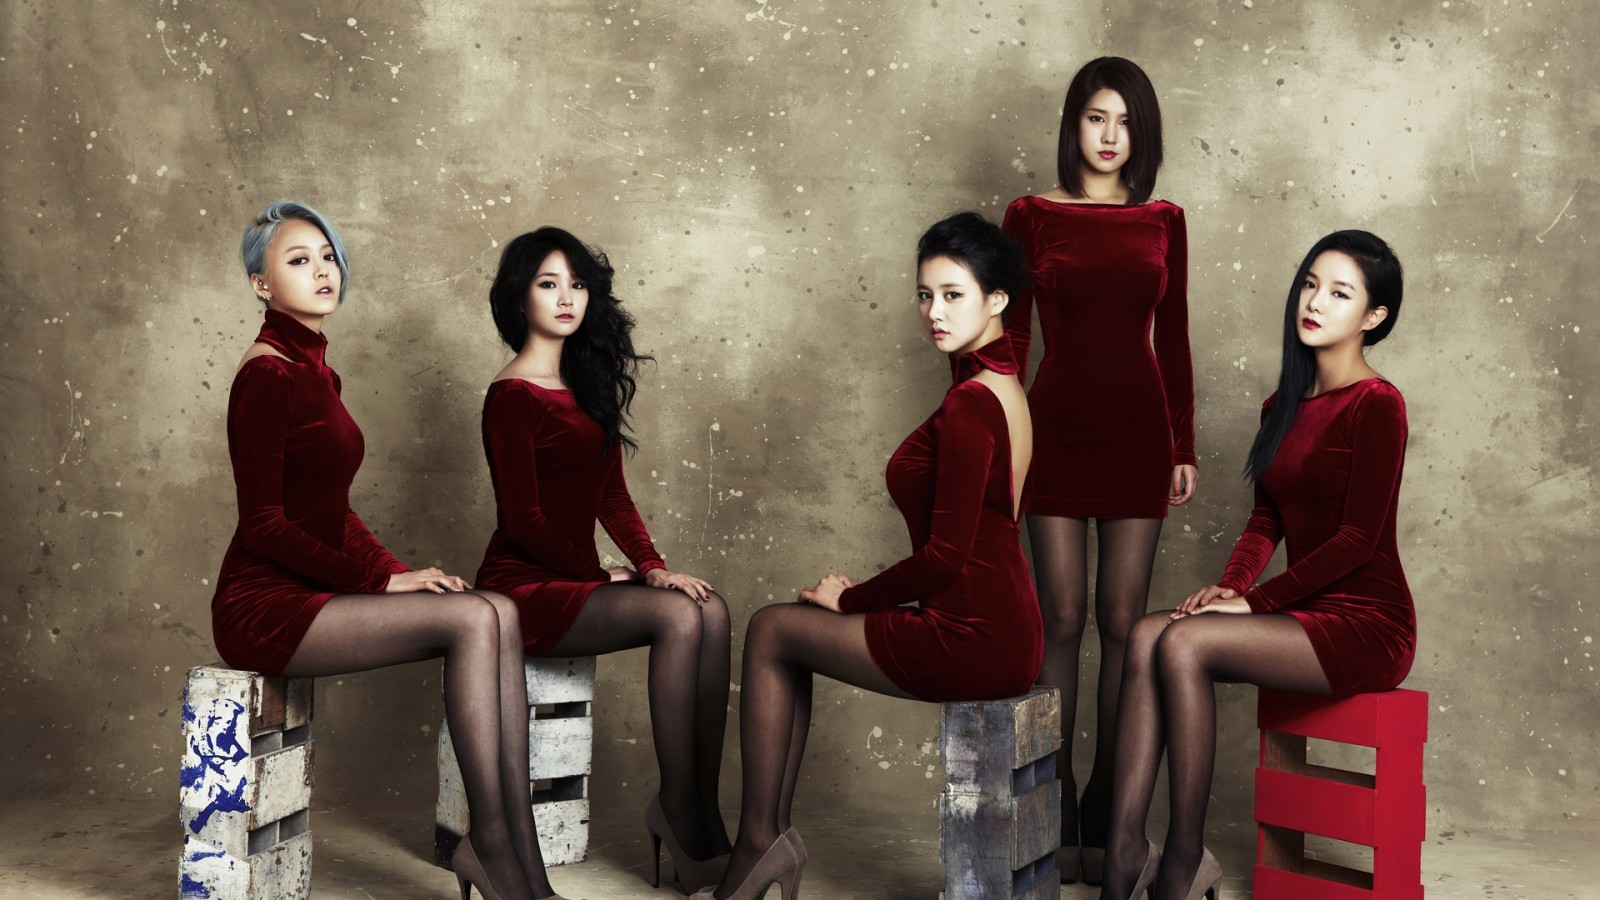 <font><b>Asian</b></font> oriental girls music band pop stars beauty lady women beautiful and sexy <font><b>Home</b></font> <font><b>Decoration</b></font> Canvas Poster